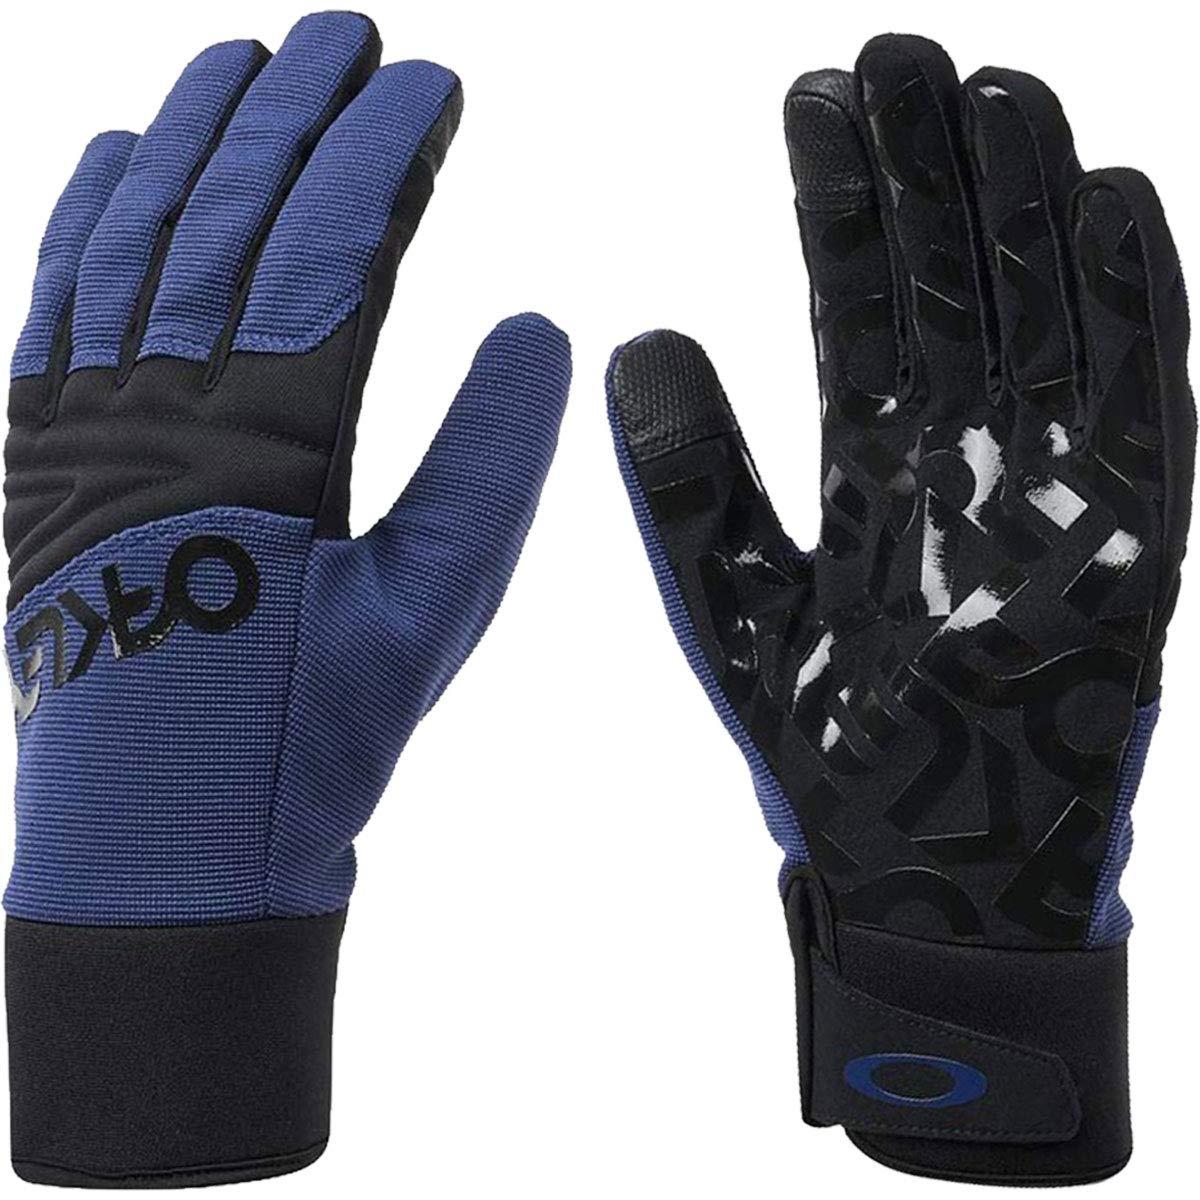 d5c797da61 Oakley Factory Park glove Oakley Technical Apparel 94308-609 ...